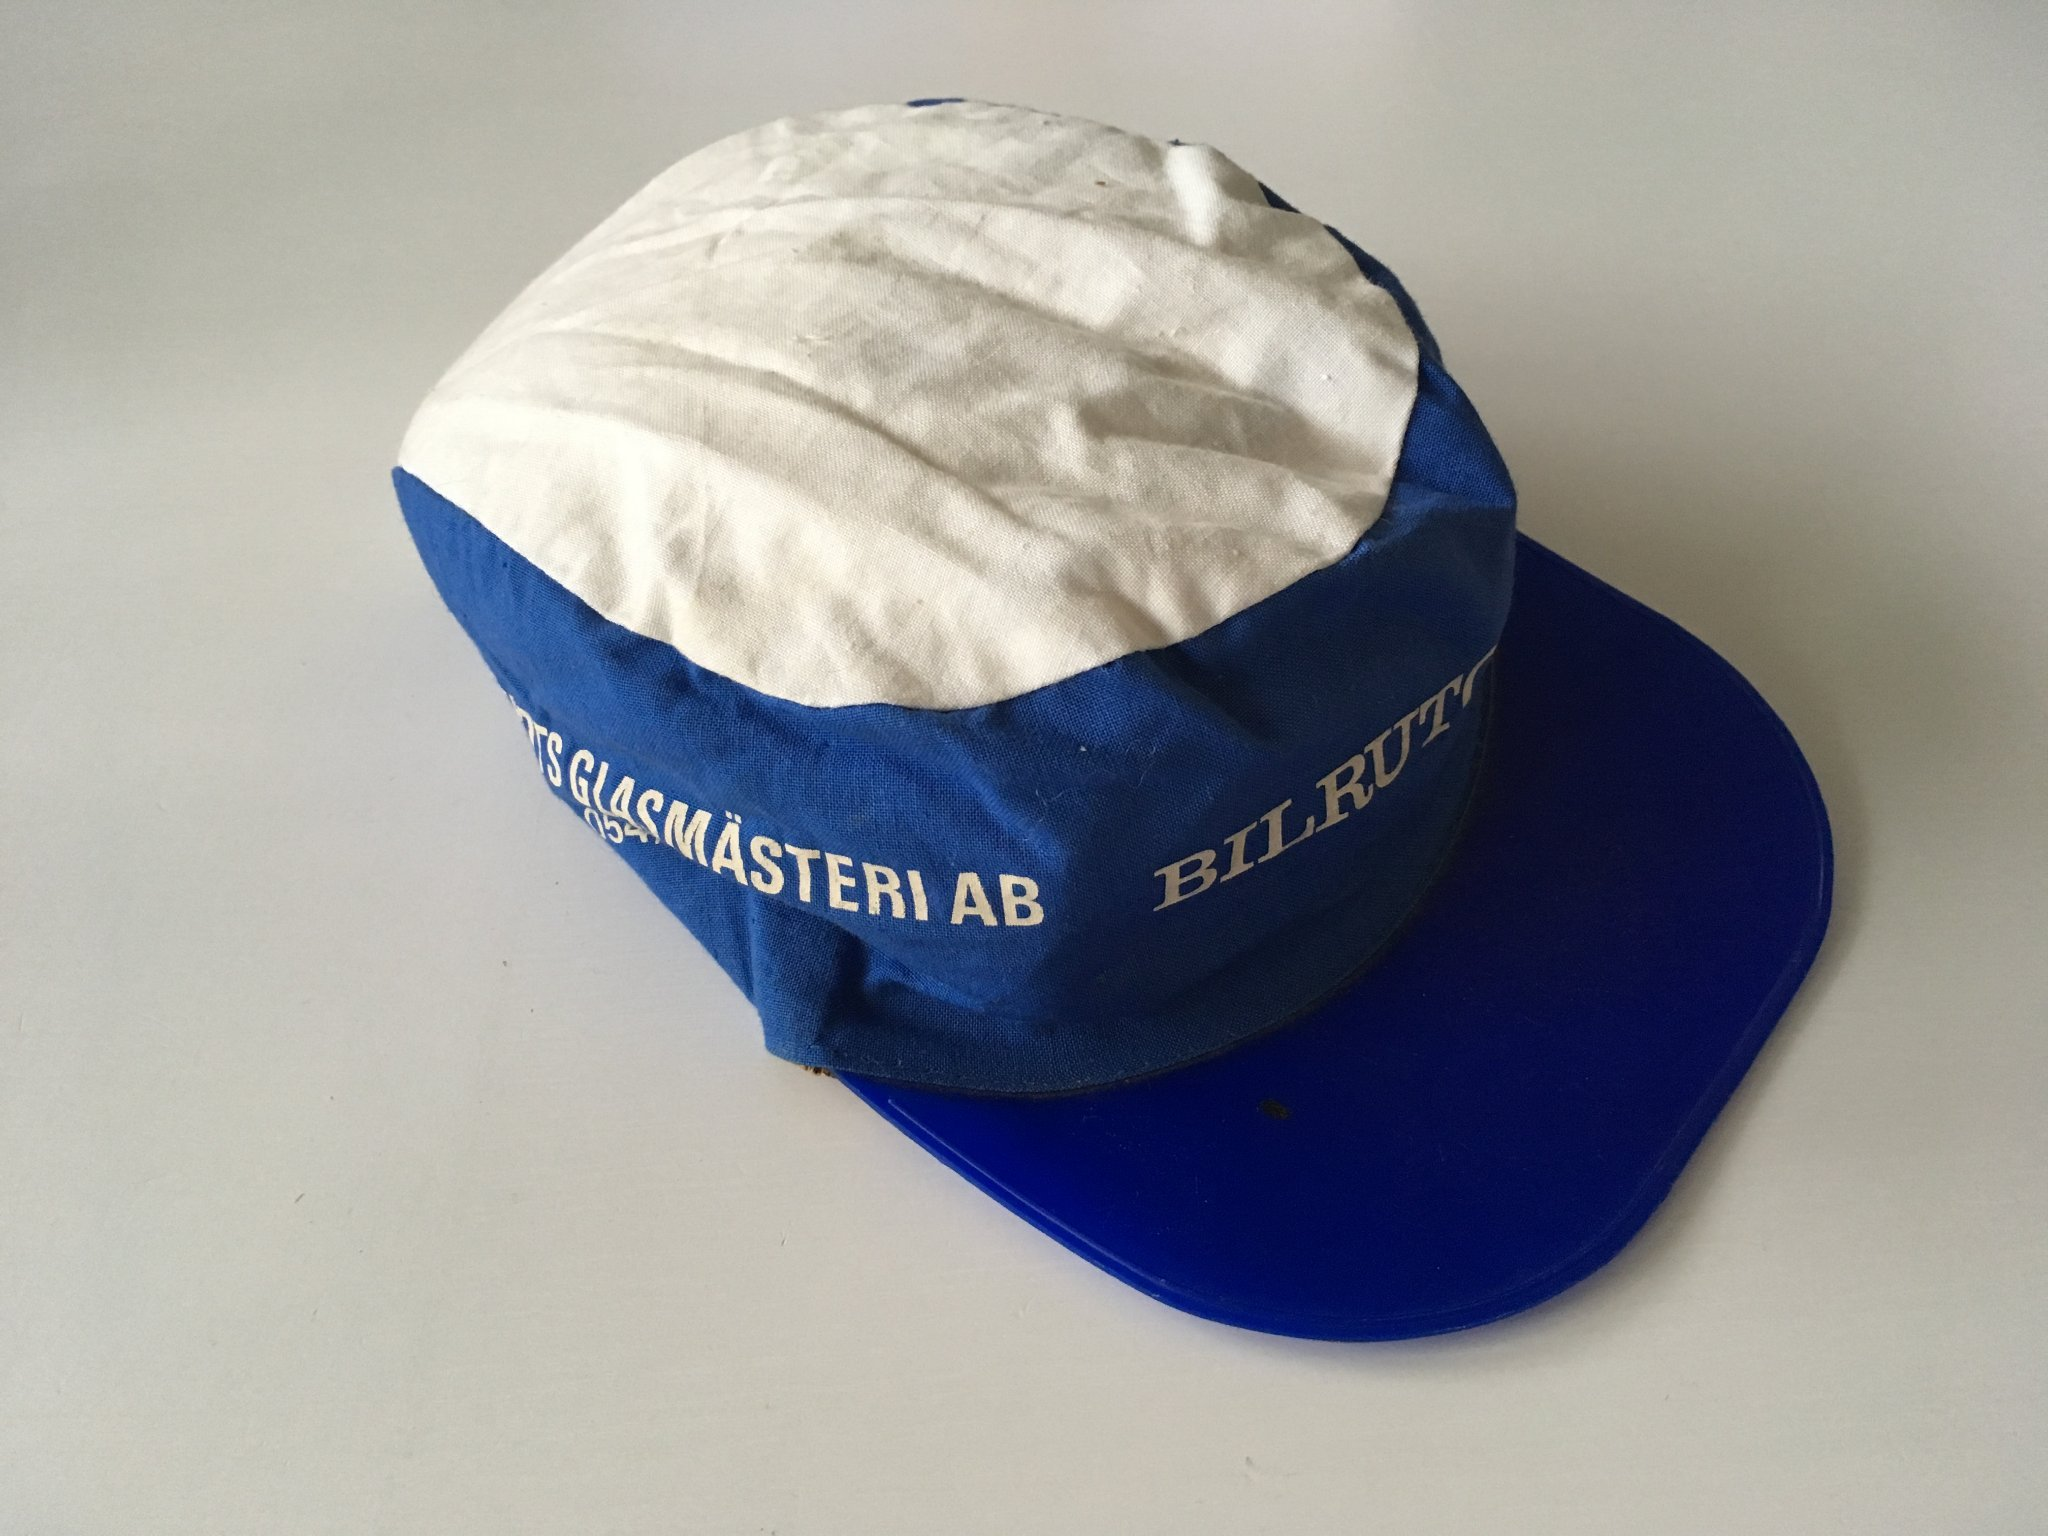 Hvittfeldts Glasmasteri Ab Gammal Reklam Keps 361533087